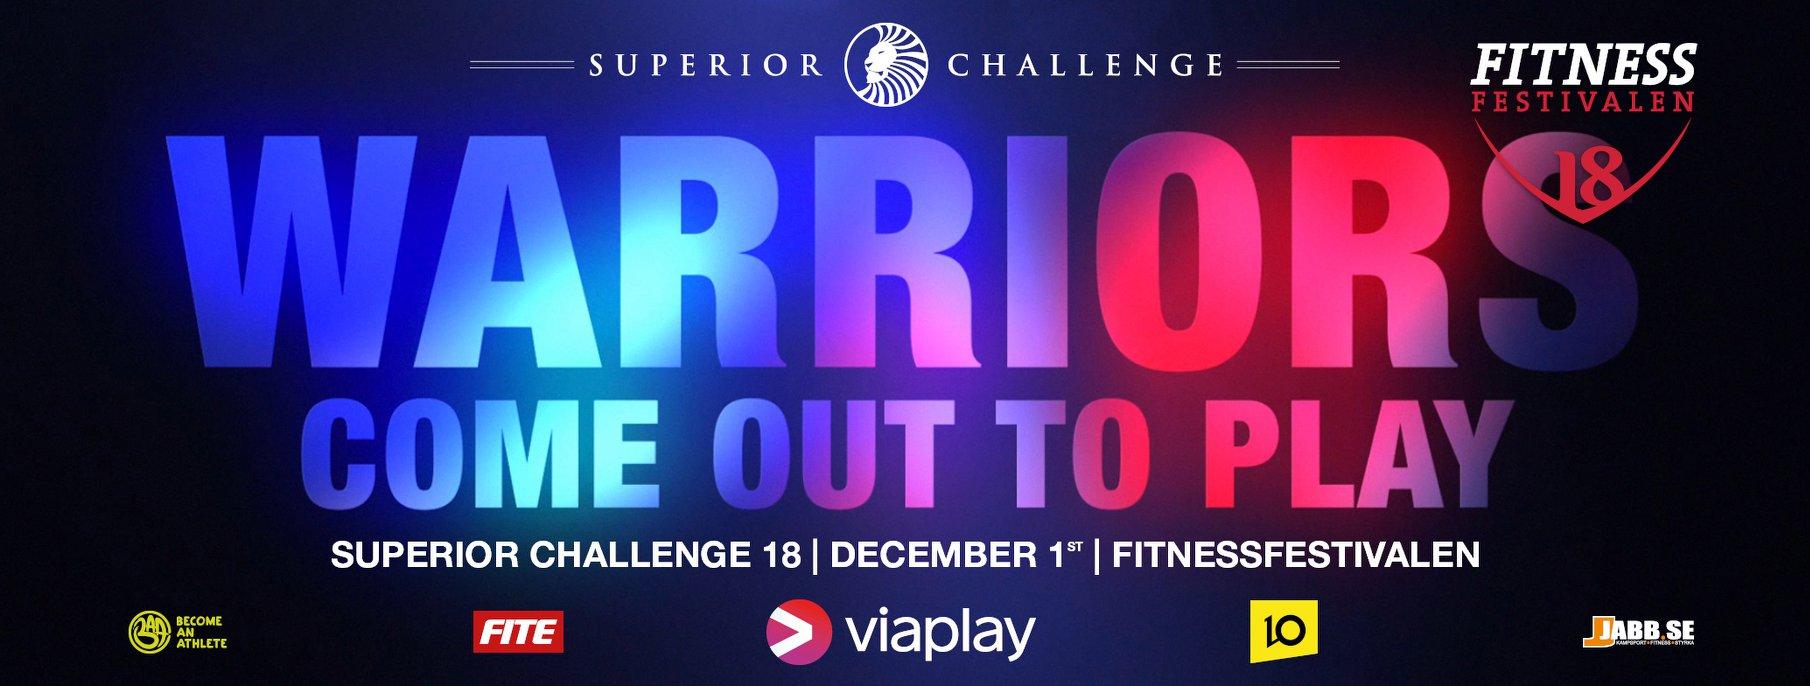 Superior Challenge 18